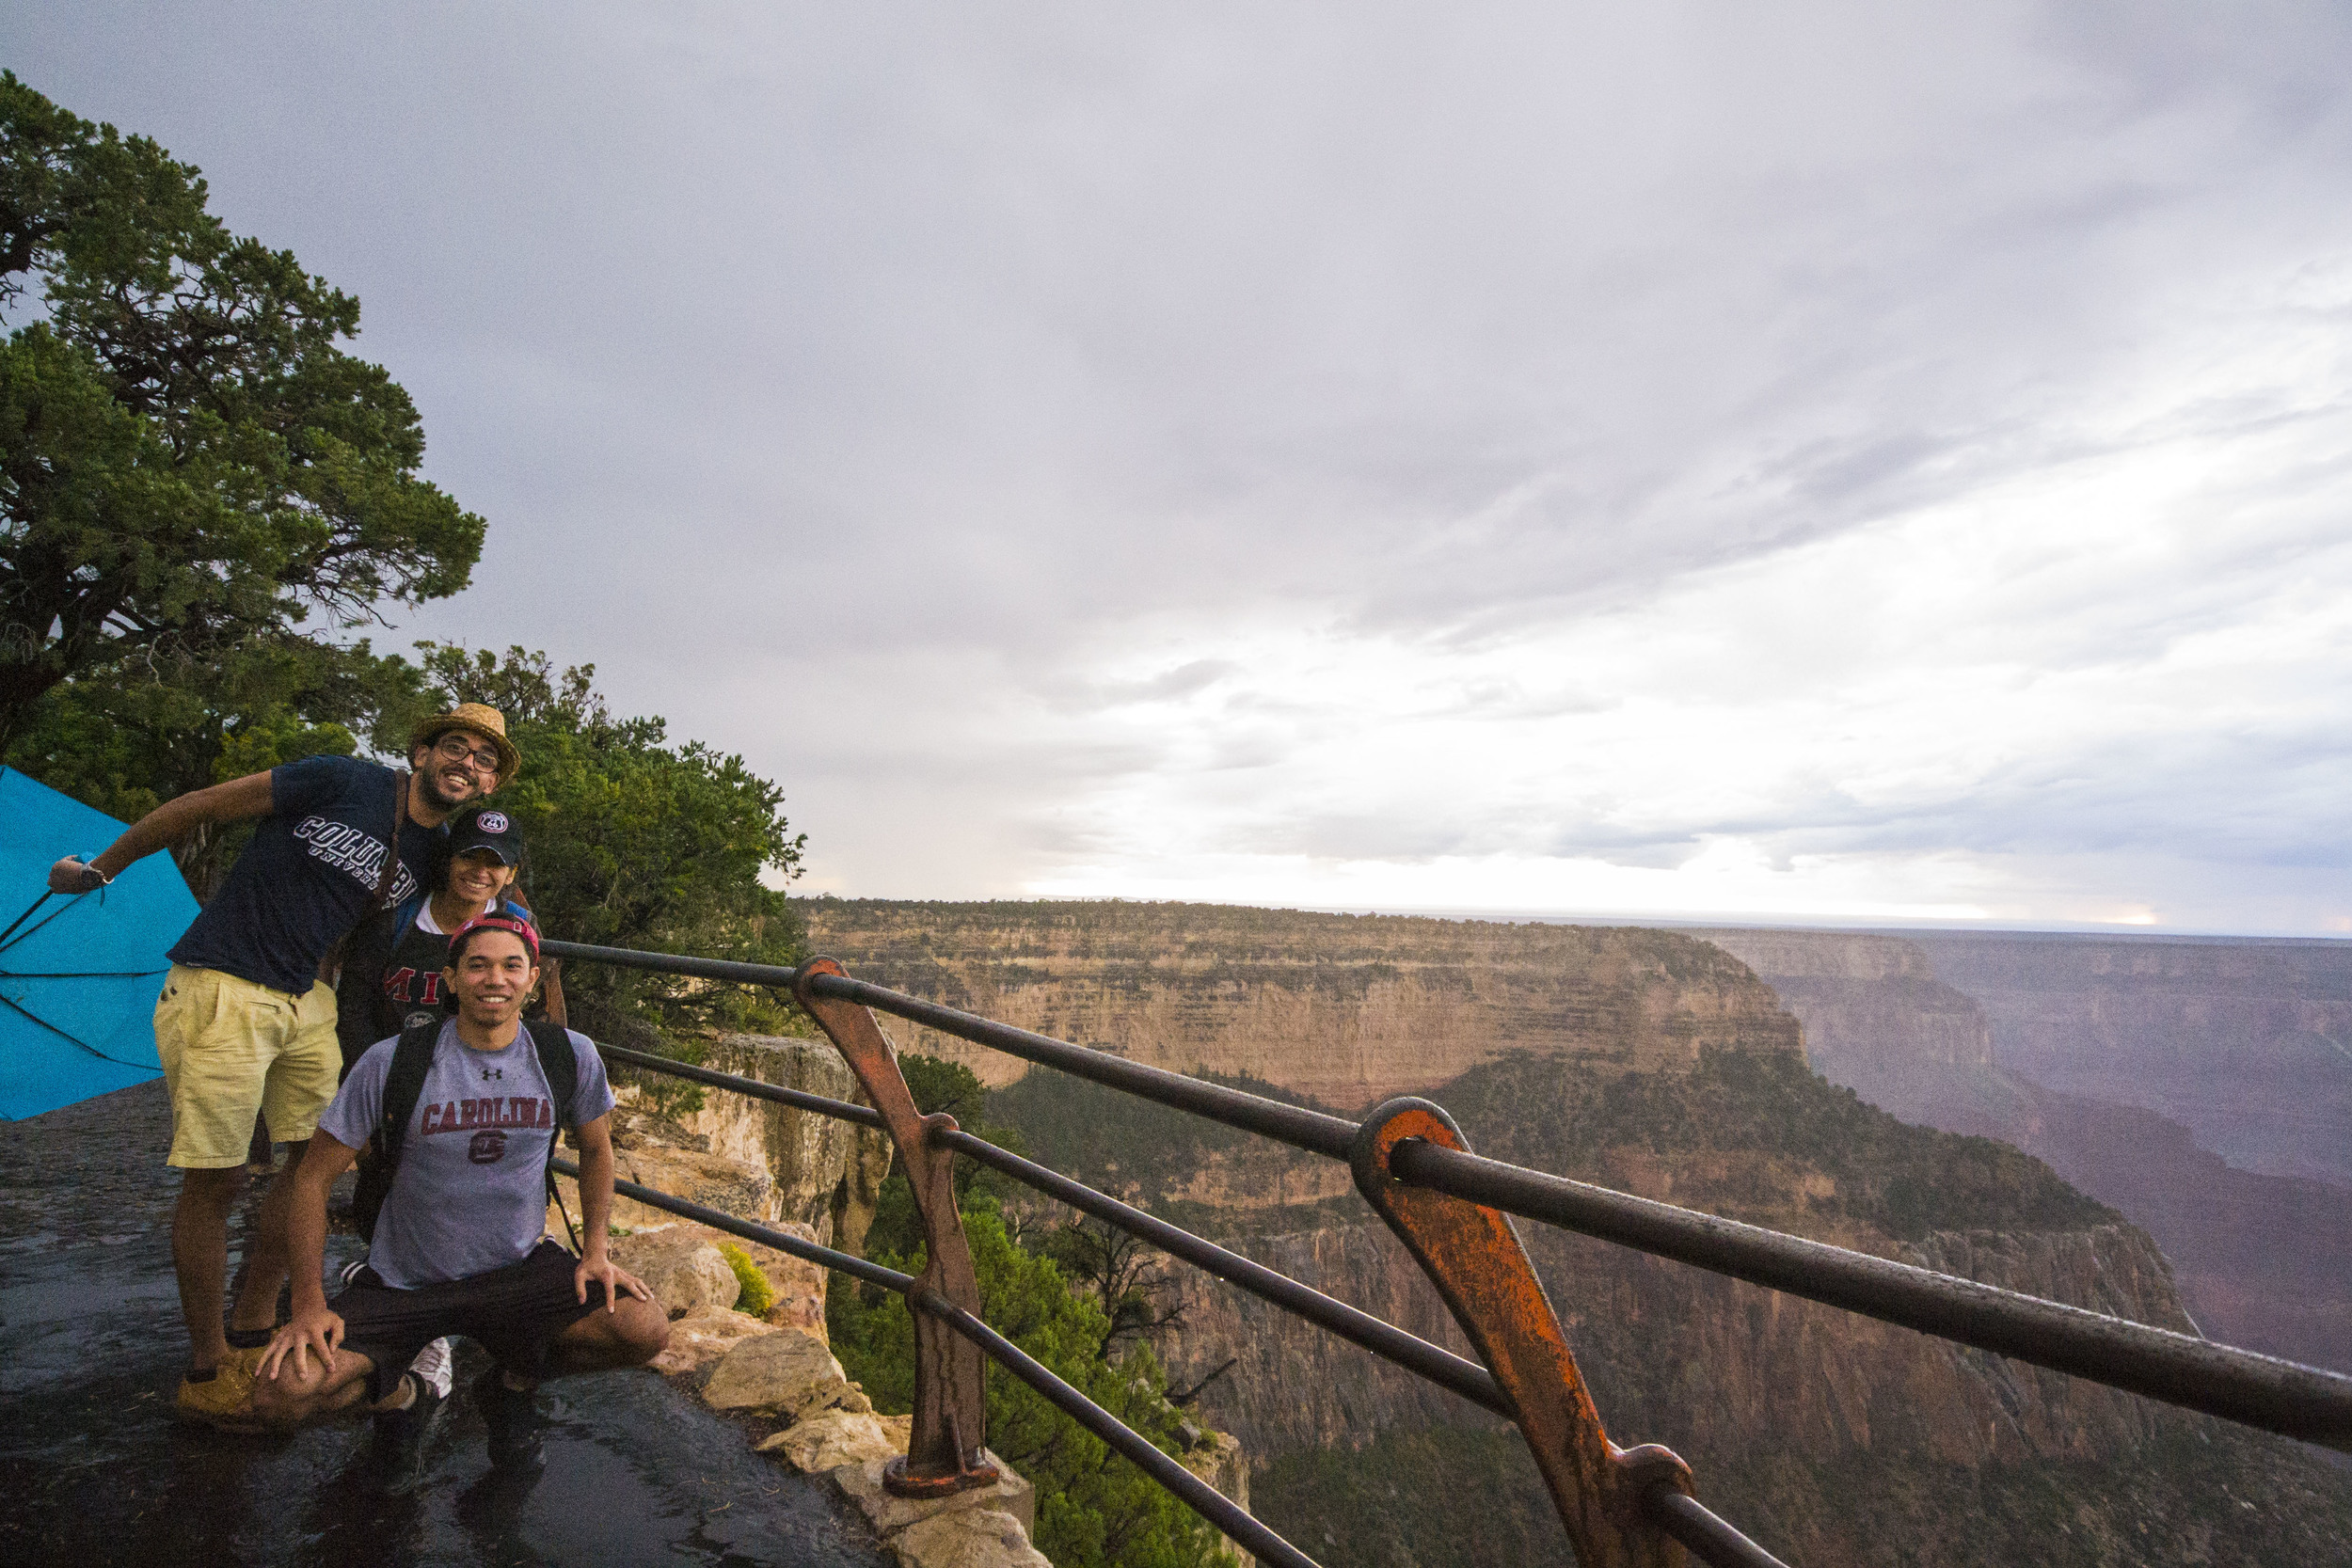 Grand Canyon_150905_0093.JPG